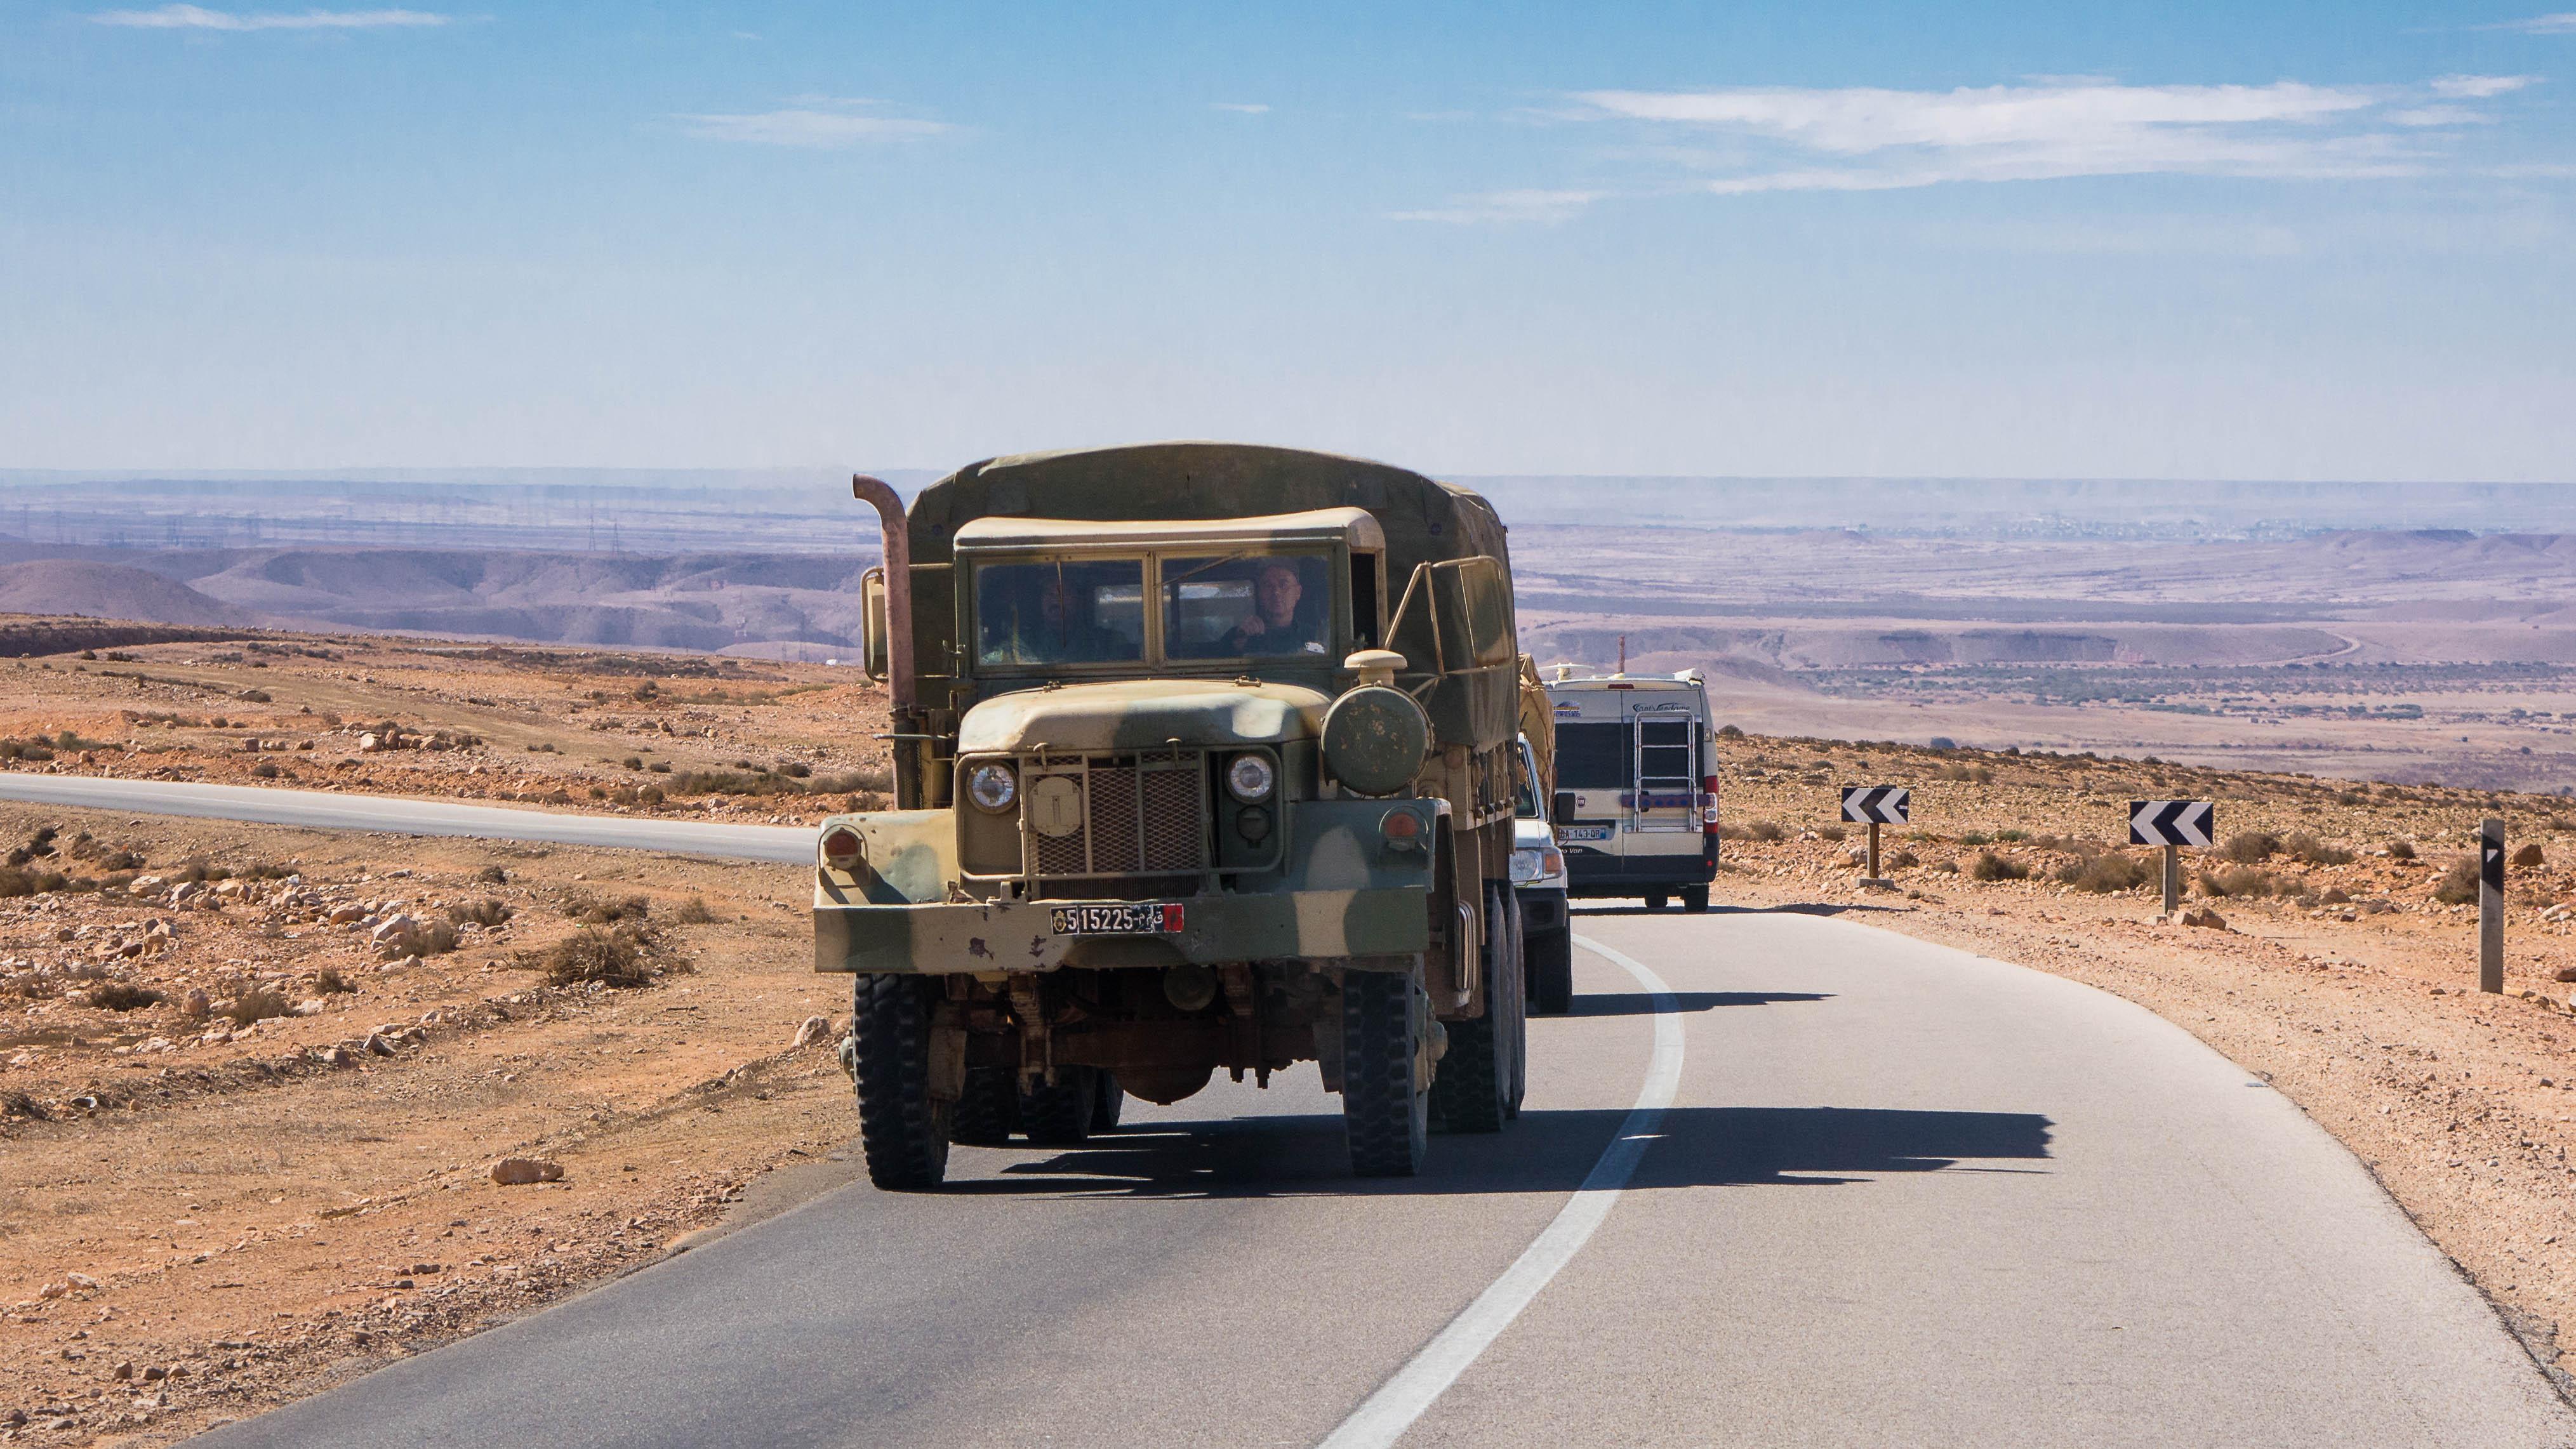 Photos - Logistique et Camions / Logistics and Trucks - Page 5 25406740384_d9ee16937f_o